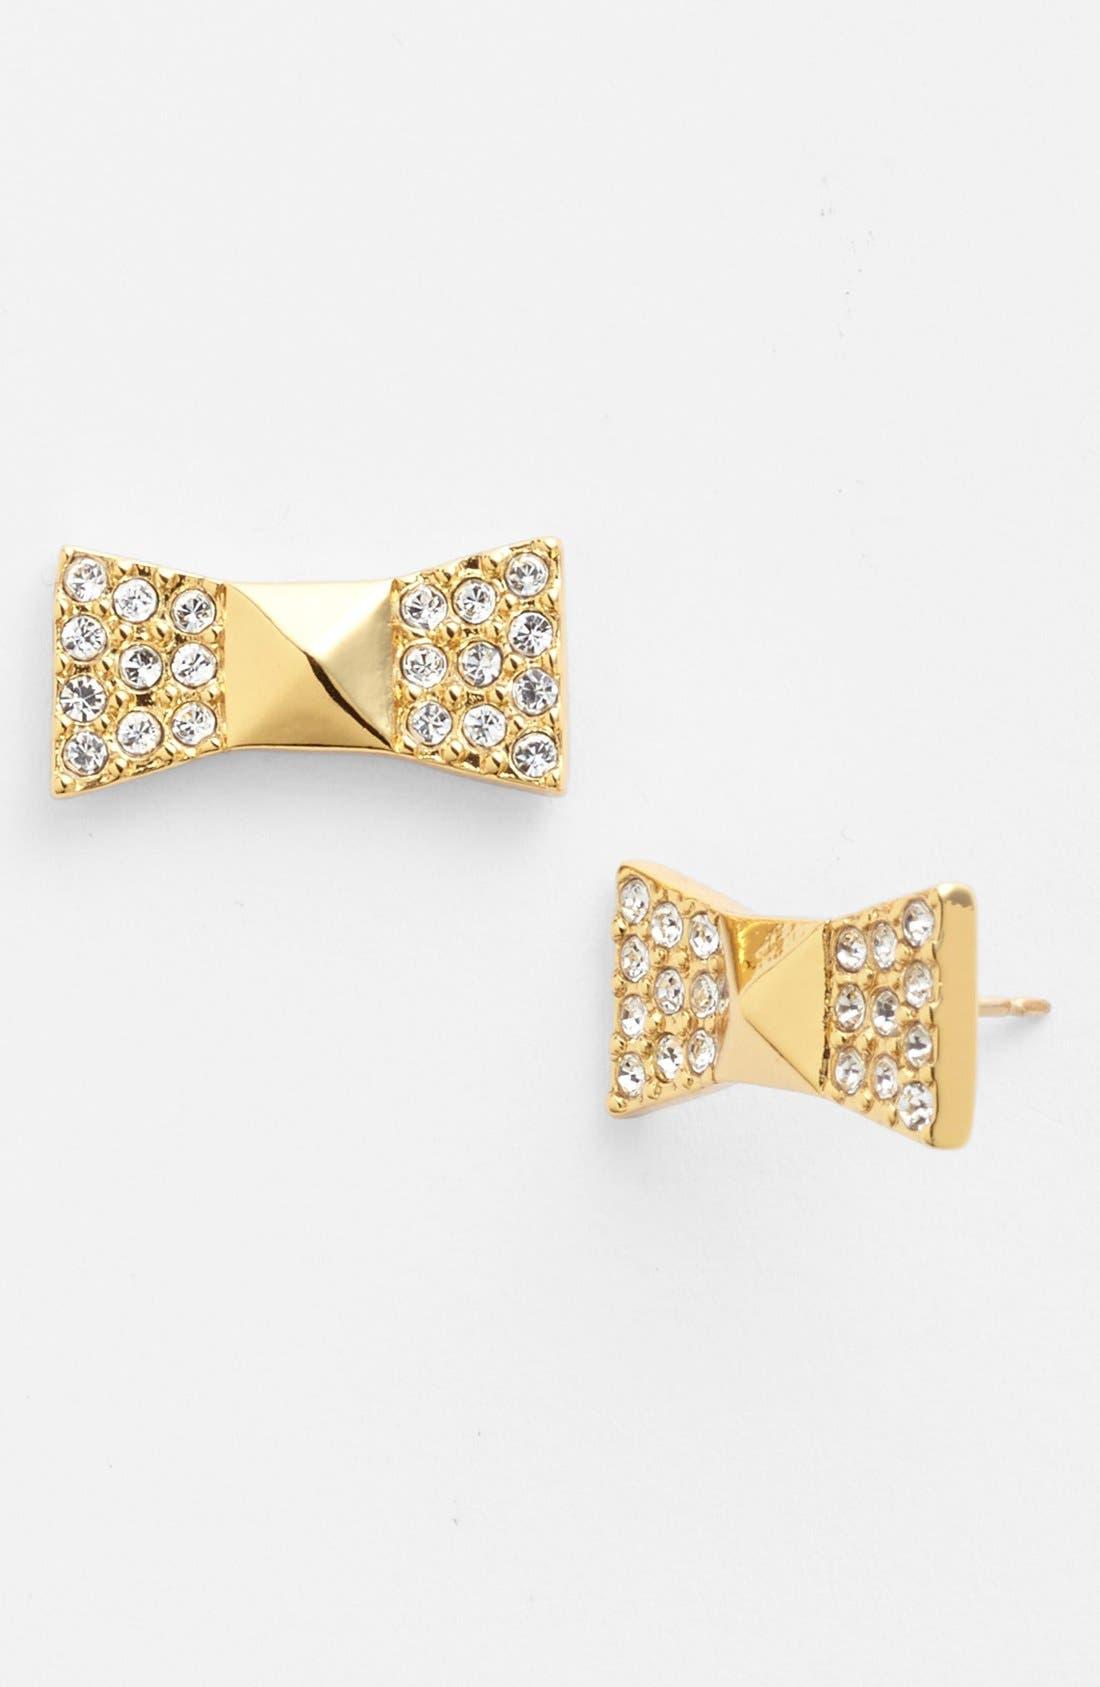 Alternate Image 1 Selected - kate spade new york 'locked in' pavé bow stud earrings